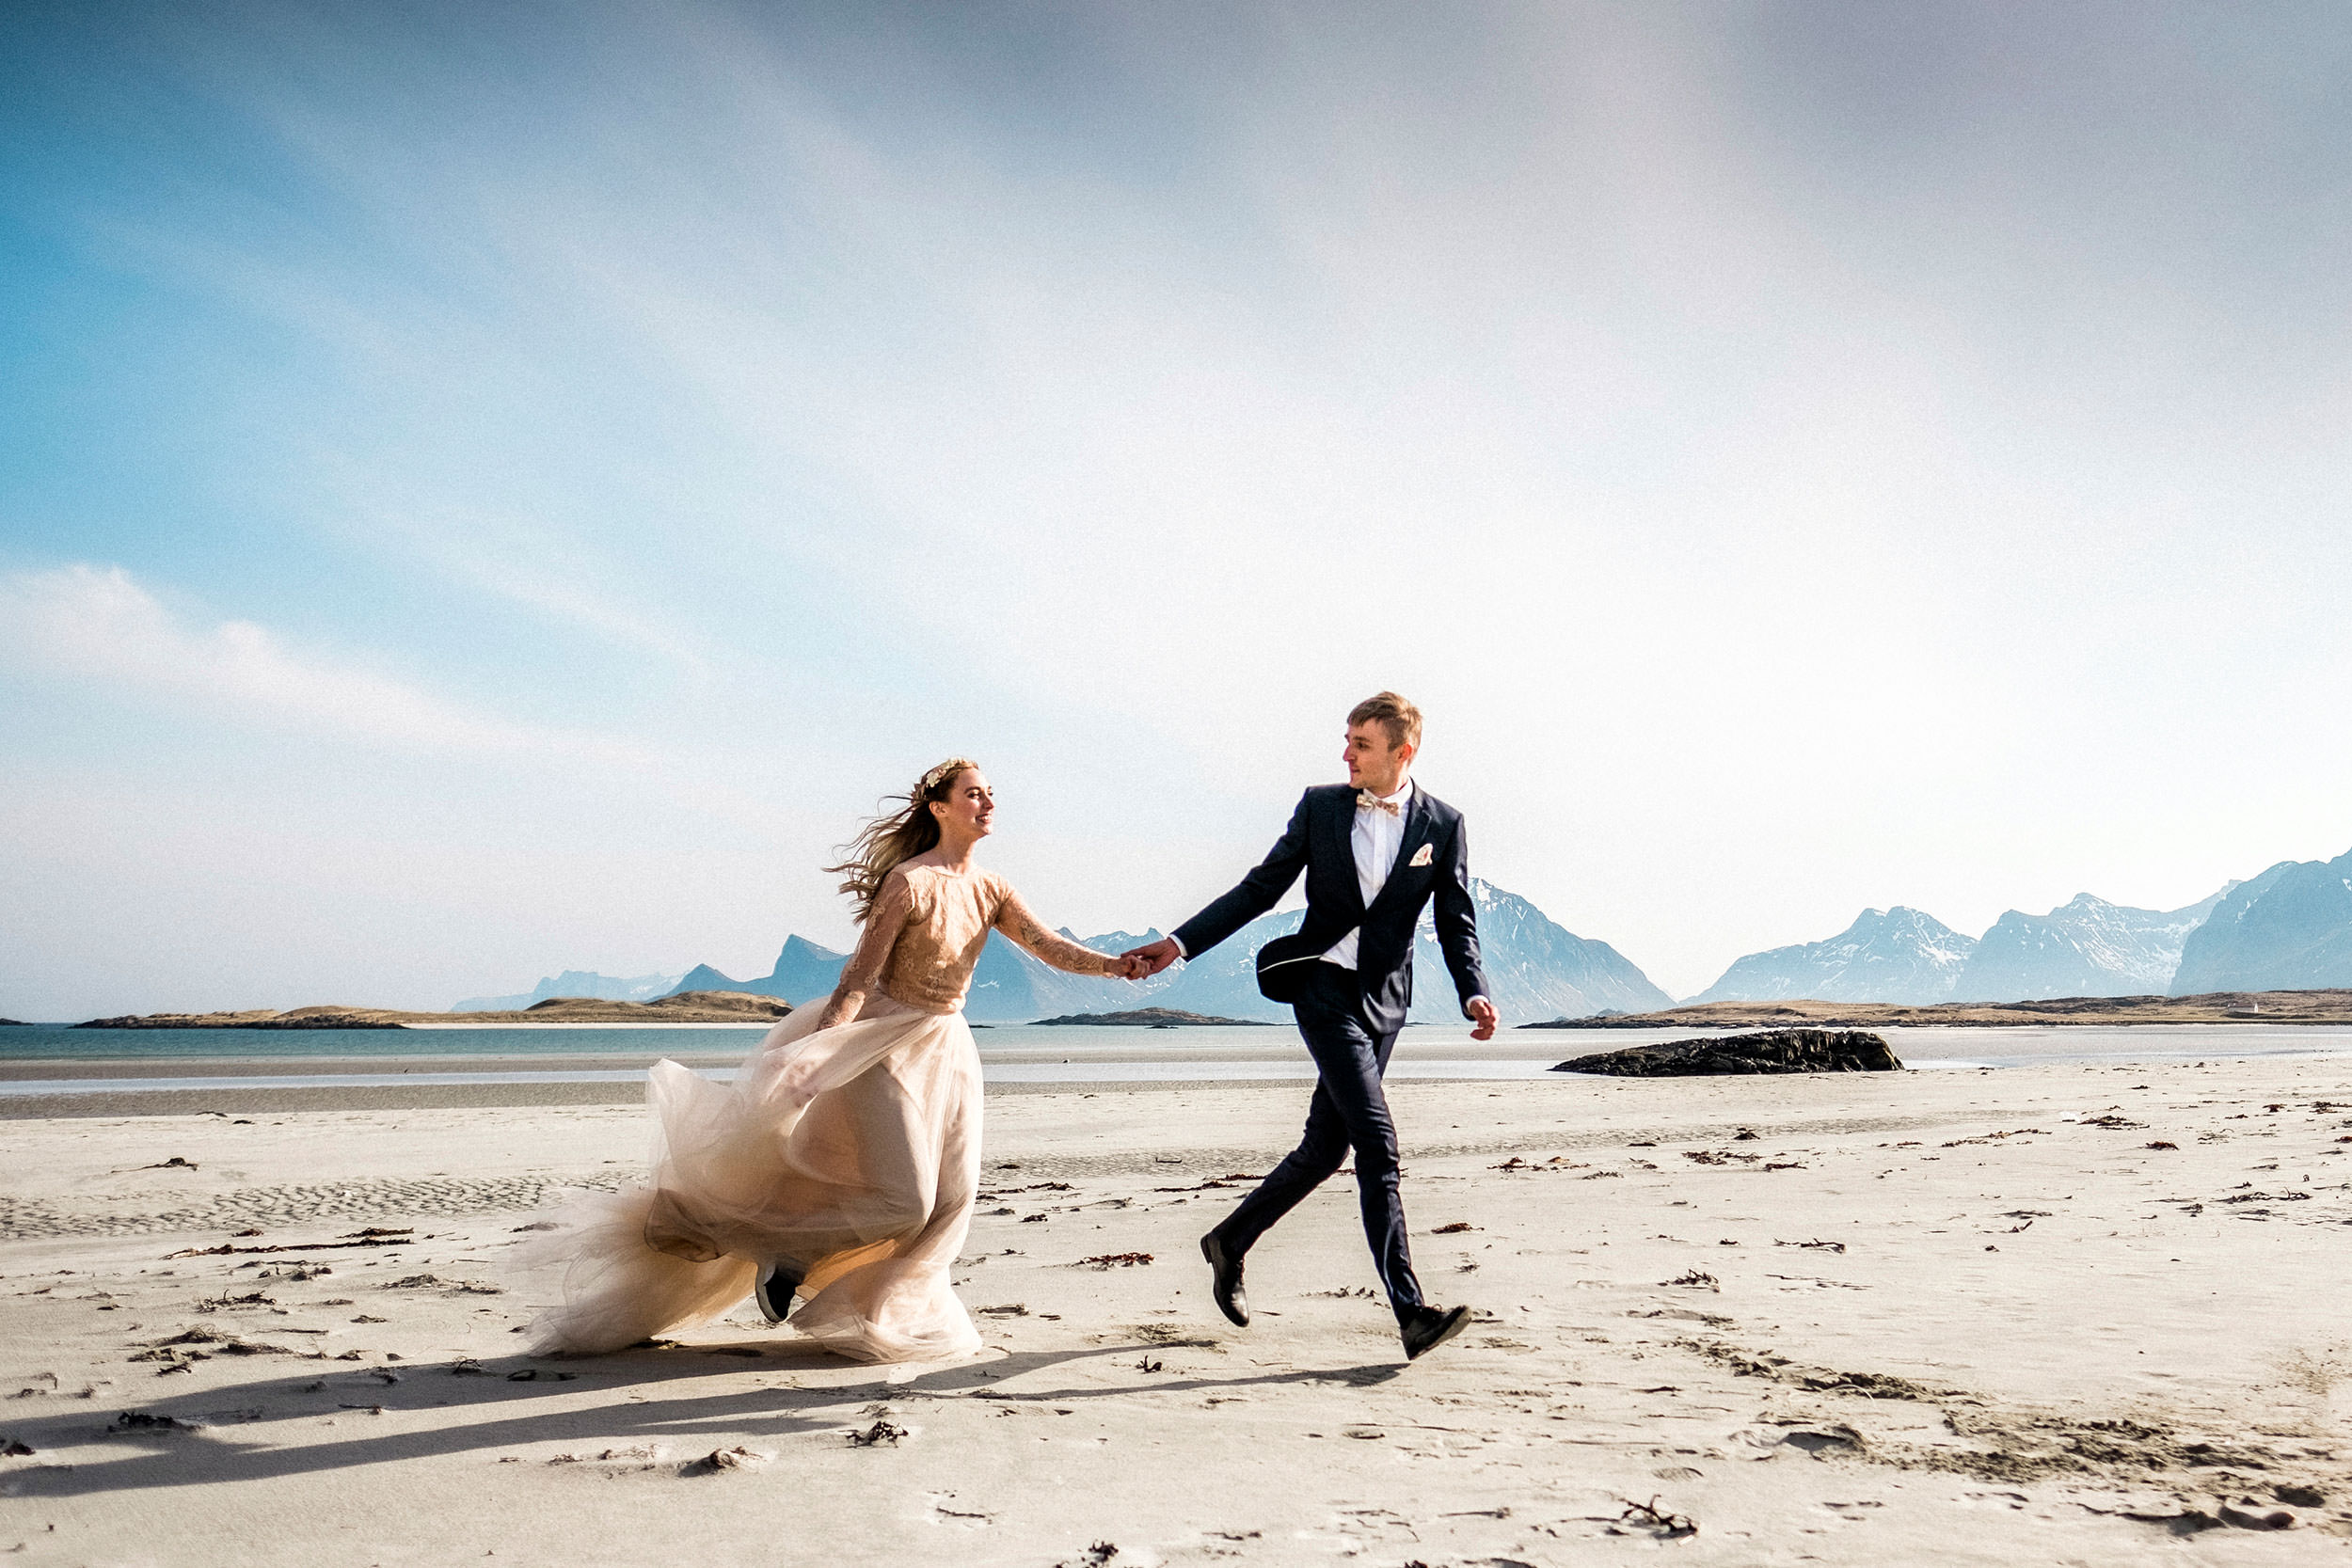 © Fotograf Jonas Burman Photography, Wedding, Iceland, Island, Norway, Norge, Sweden, Sverige, Cannes, bröllop, tulle, skirt, ellen marie bridal, sisters in law, bridal tulle, bridal tulle skirt, bridal skirt, color bridal skirt, estela garro atelier, bröllopsinspiration, bröllopsfotograf Umeå